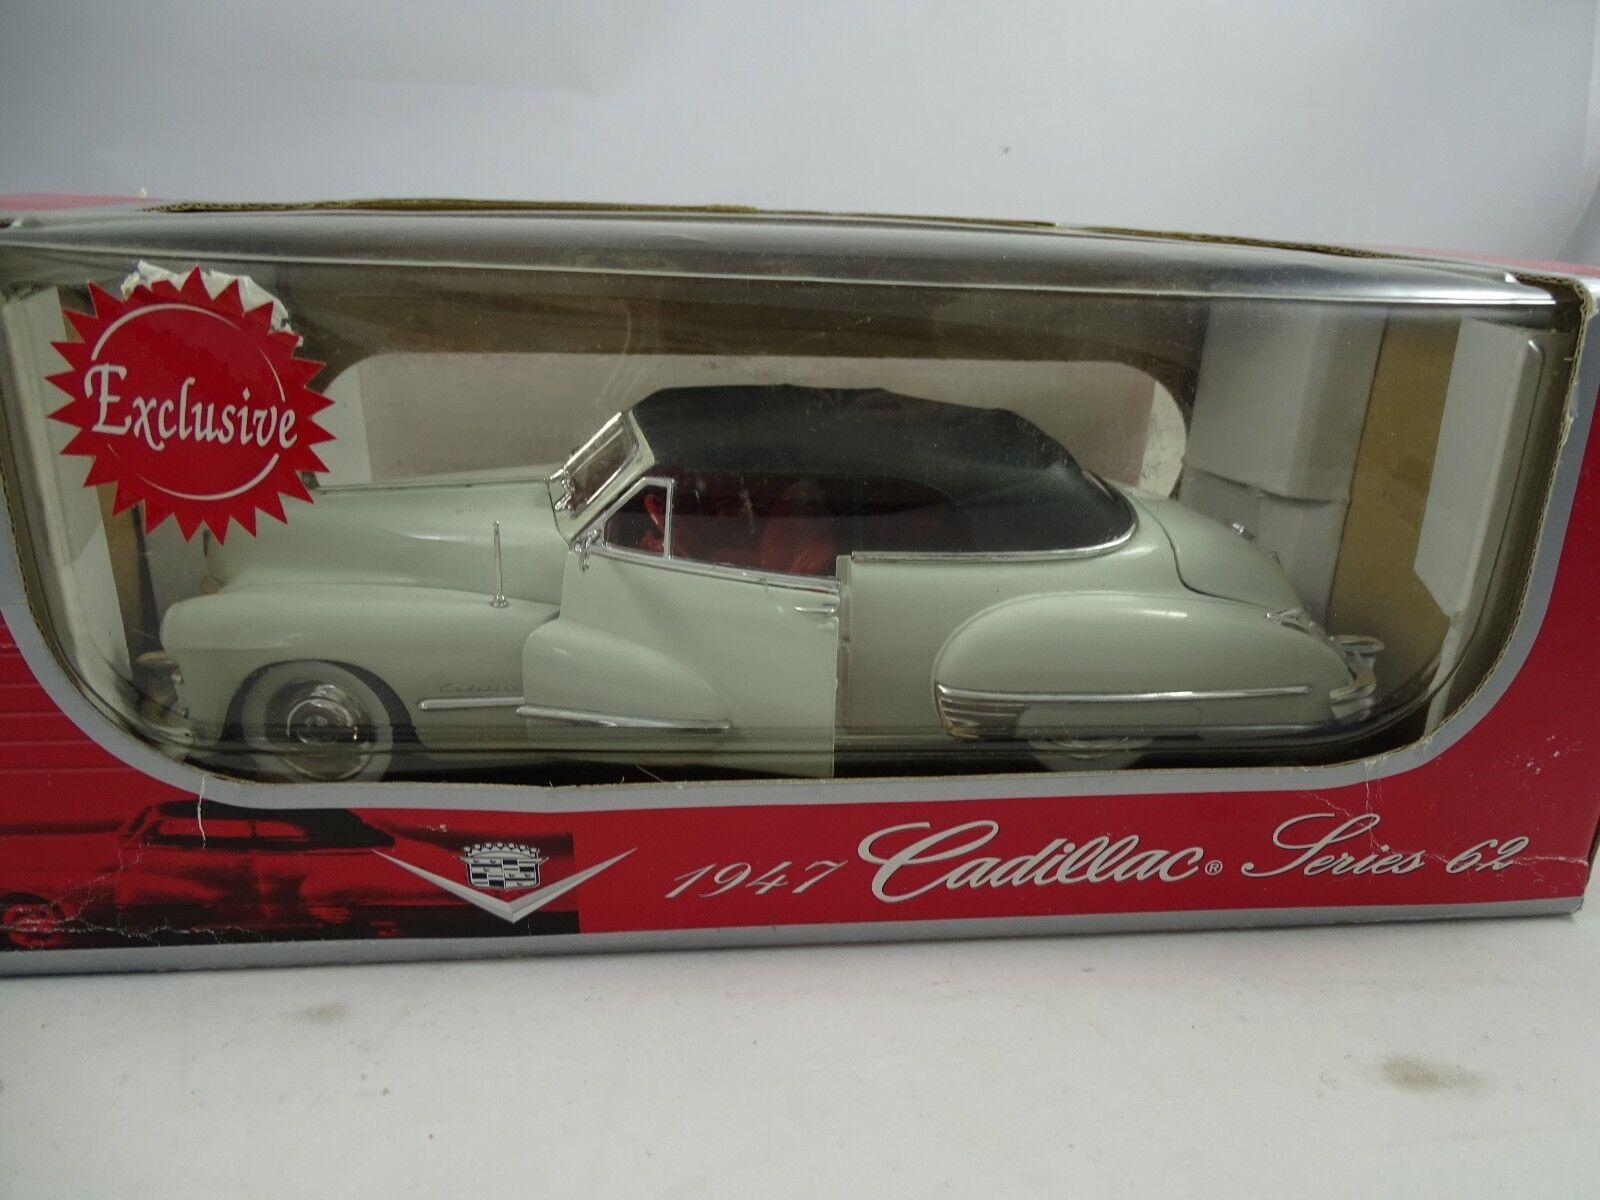 1 18 Anson  30345 - 1947 Cadillac Series 62 cremeWeiß - RARITÄT